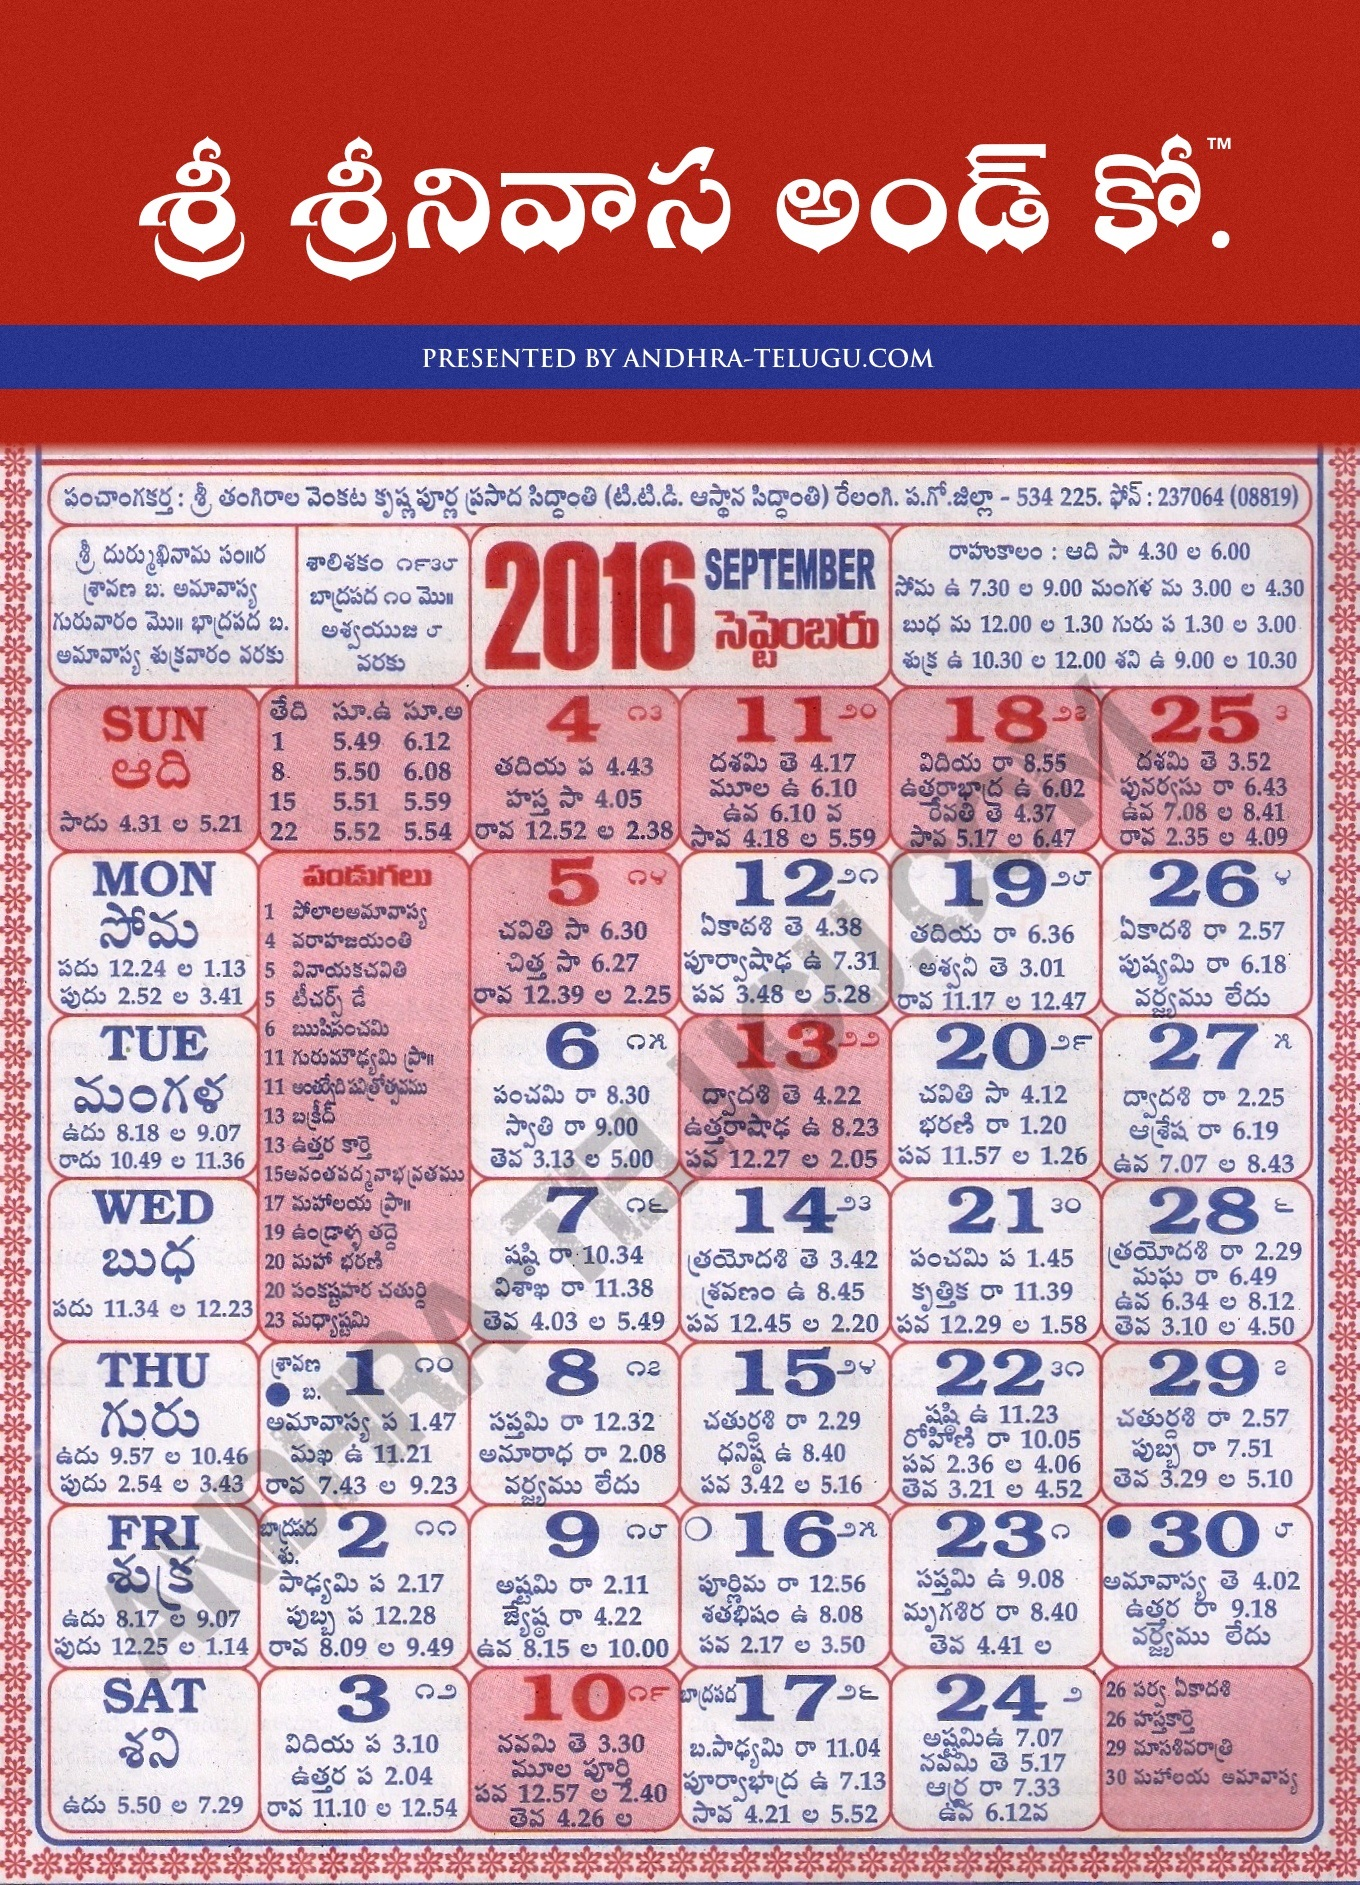 Srinivasa and Co Telugu Calendar 2016 | Andhra-Telugu